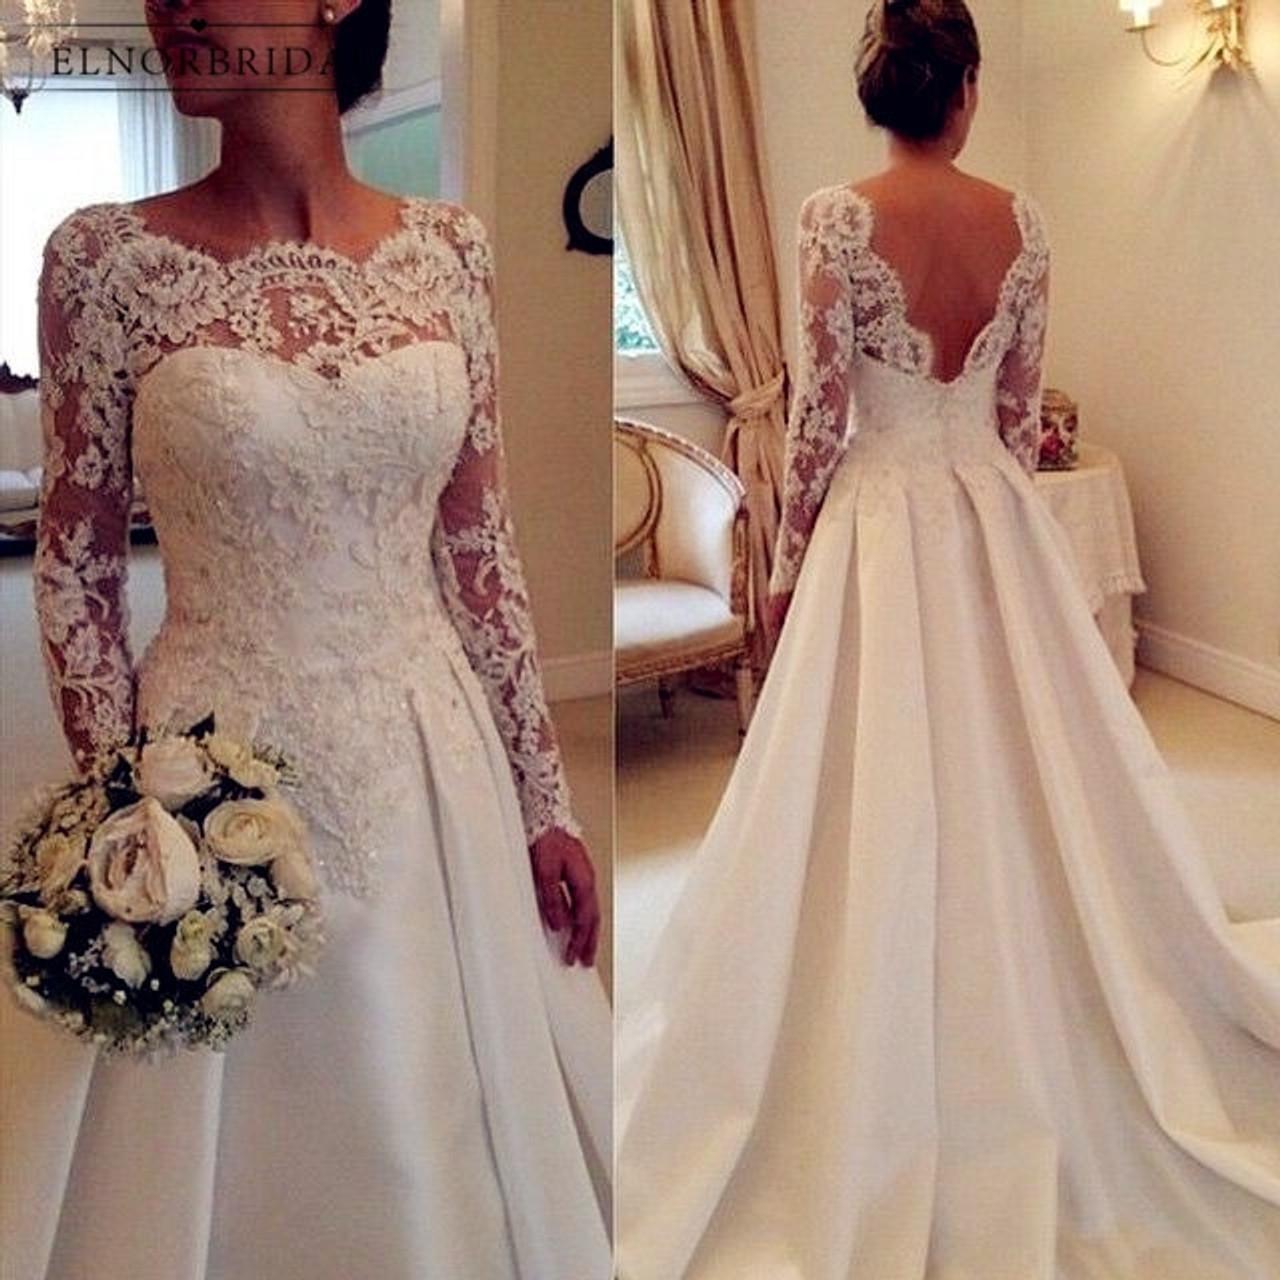 White Ivory Long Sleeve Lace Wedding Dresses 2018 Casamento Sheer